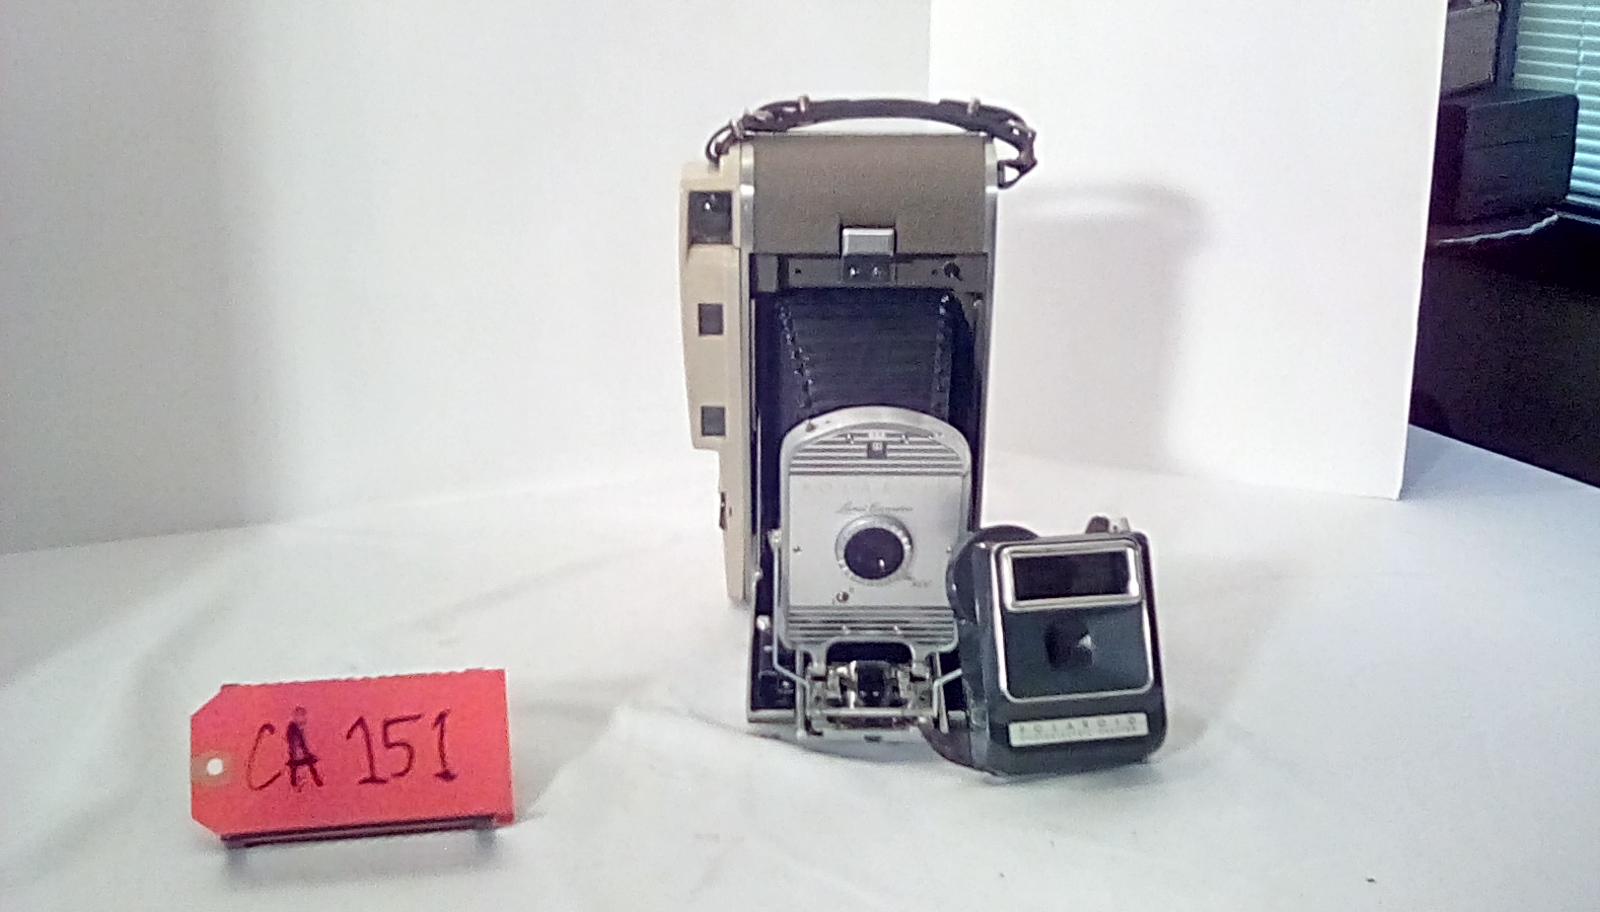 CA151 Polaroid Land camera, photo electric shutter, w/leather case